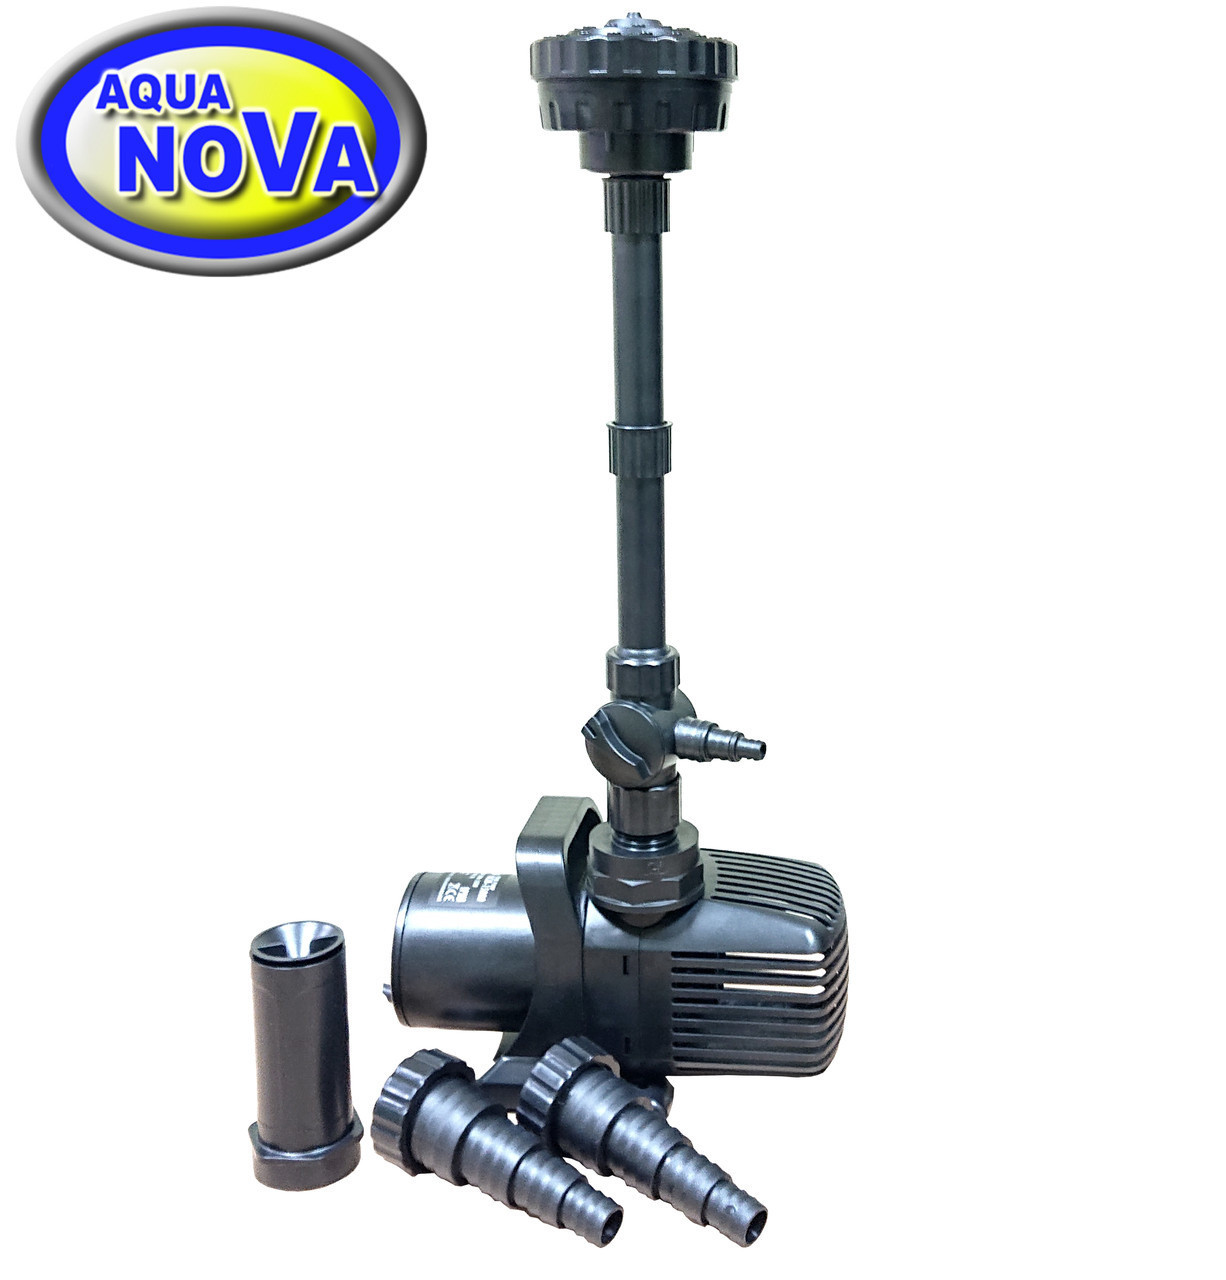 Насос для пруда AquaNova NCM-15000 л/час Fountain